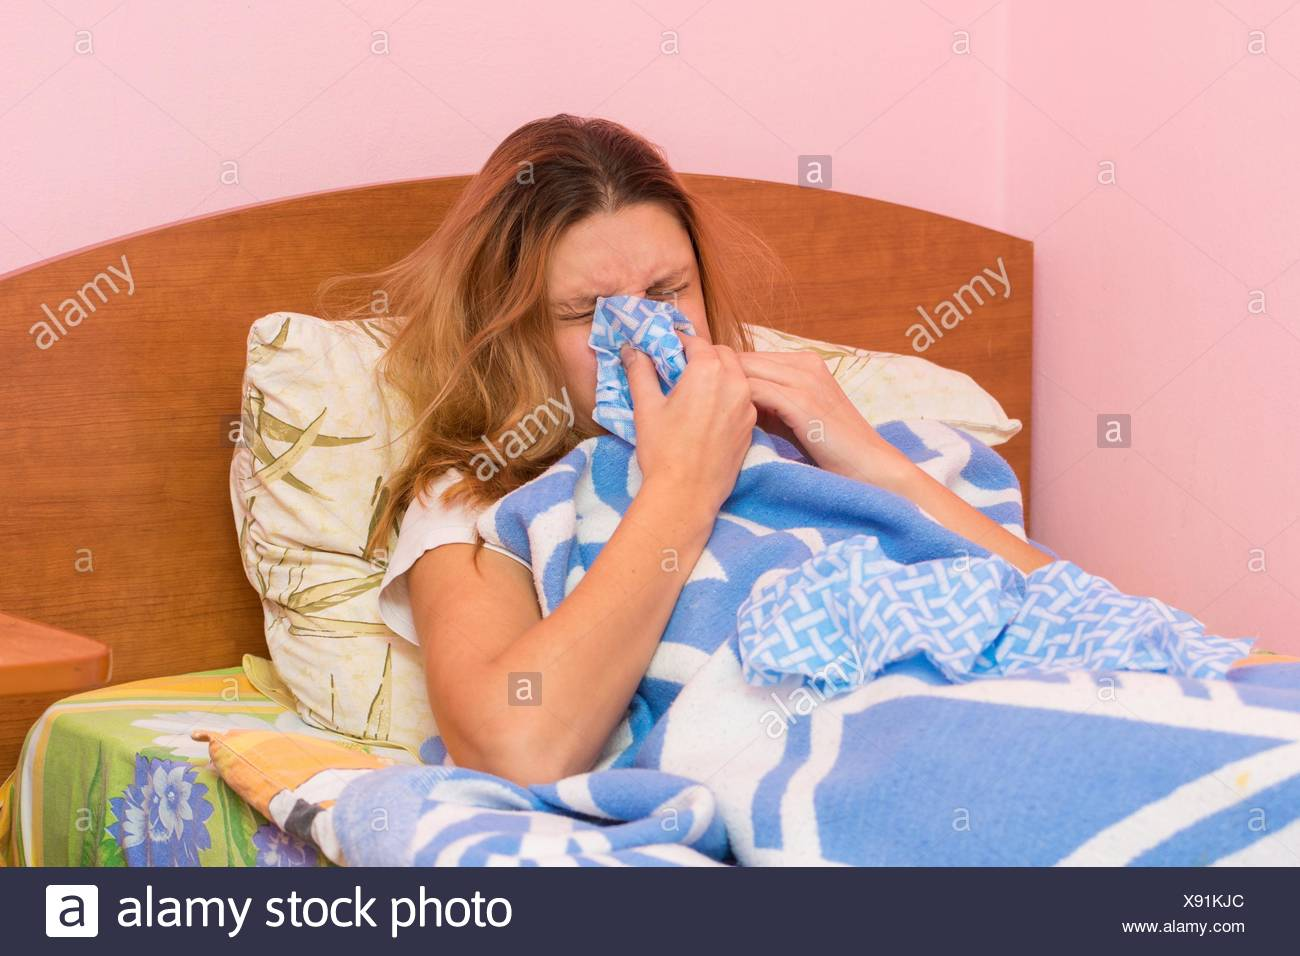 She sneezes ill with acute respiratory illness. - Stock Image